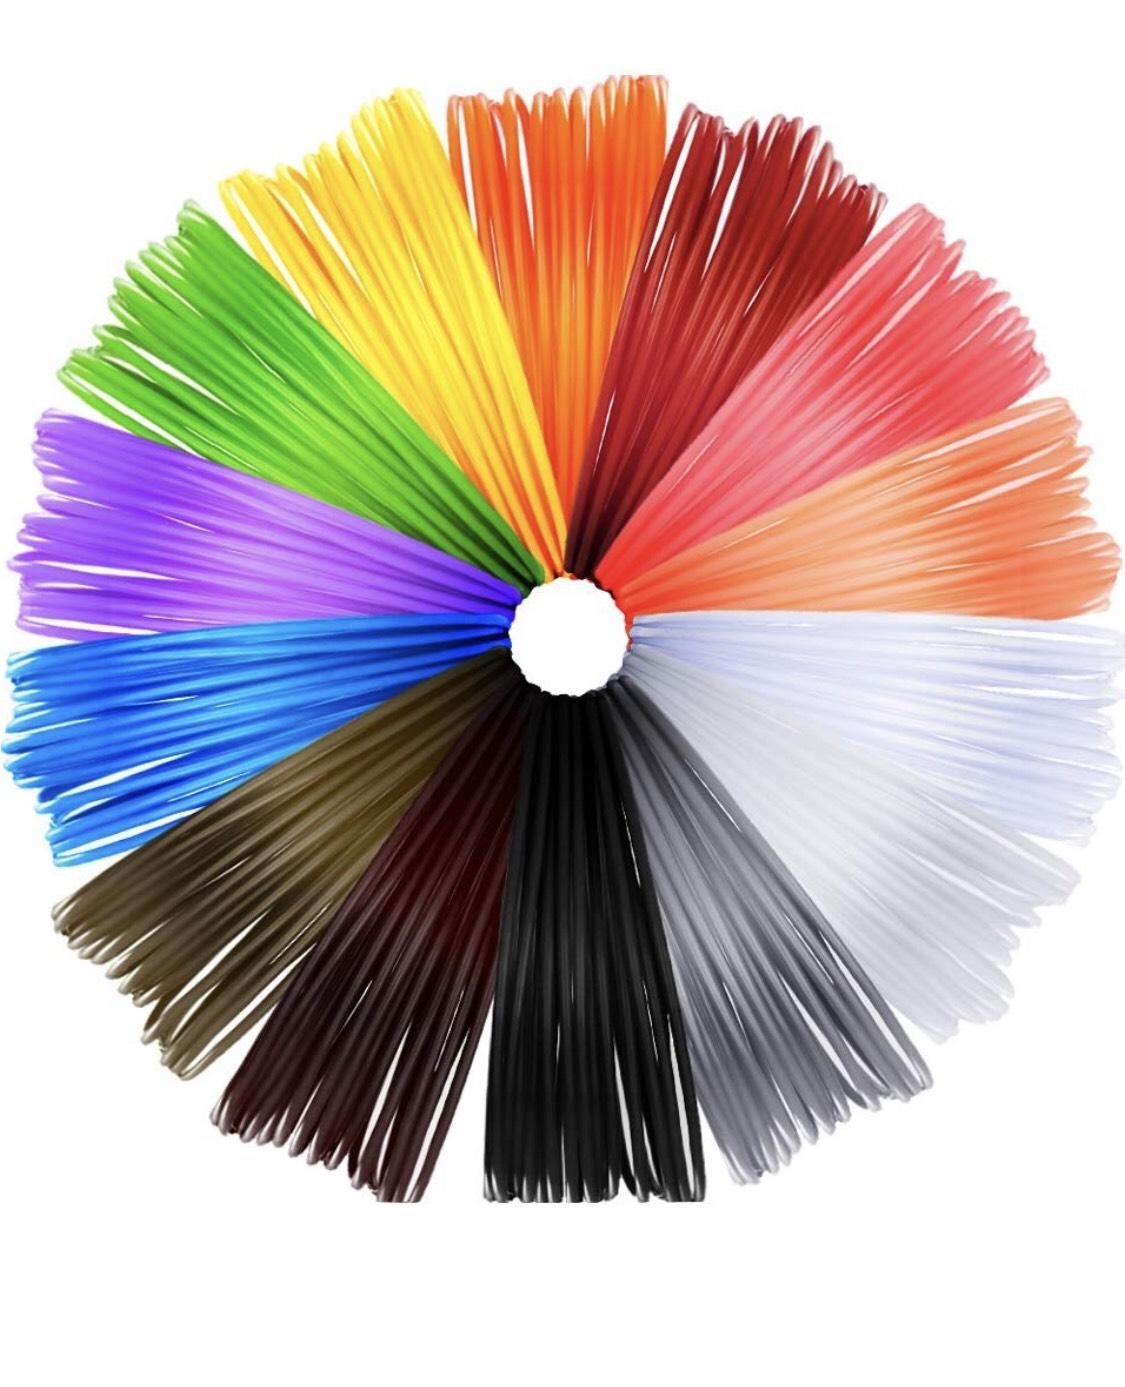 Filamento de colores